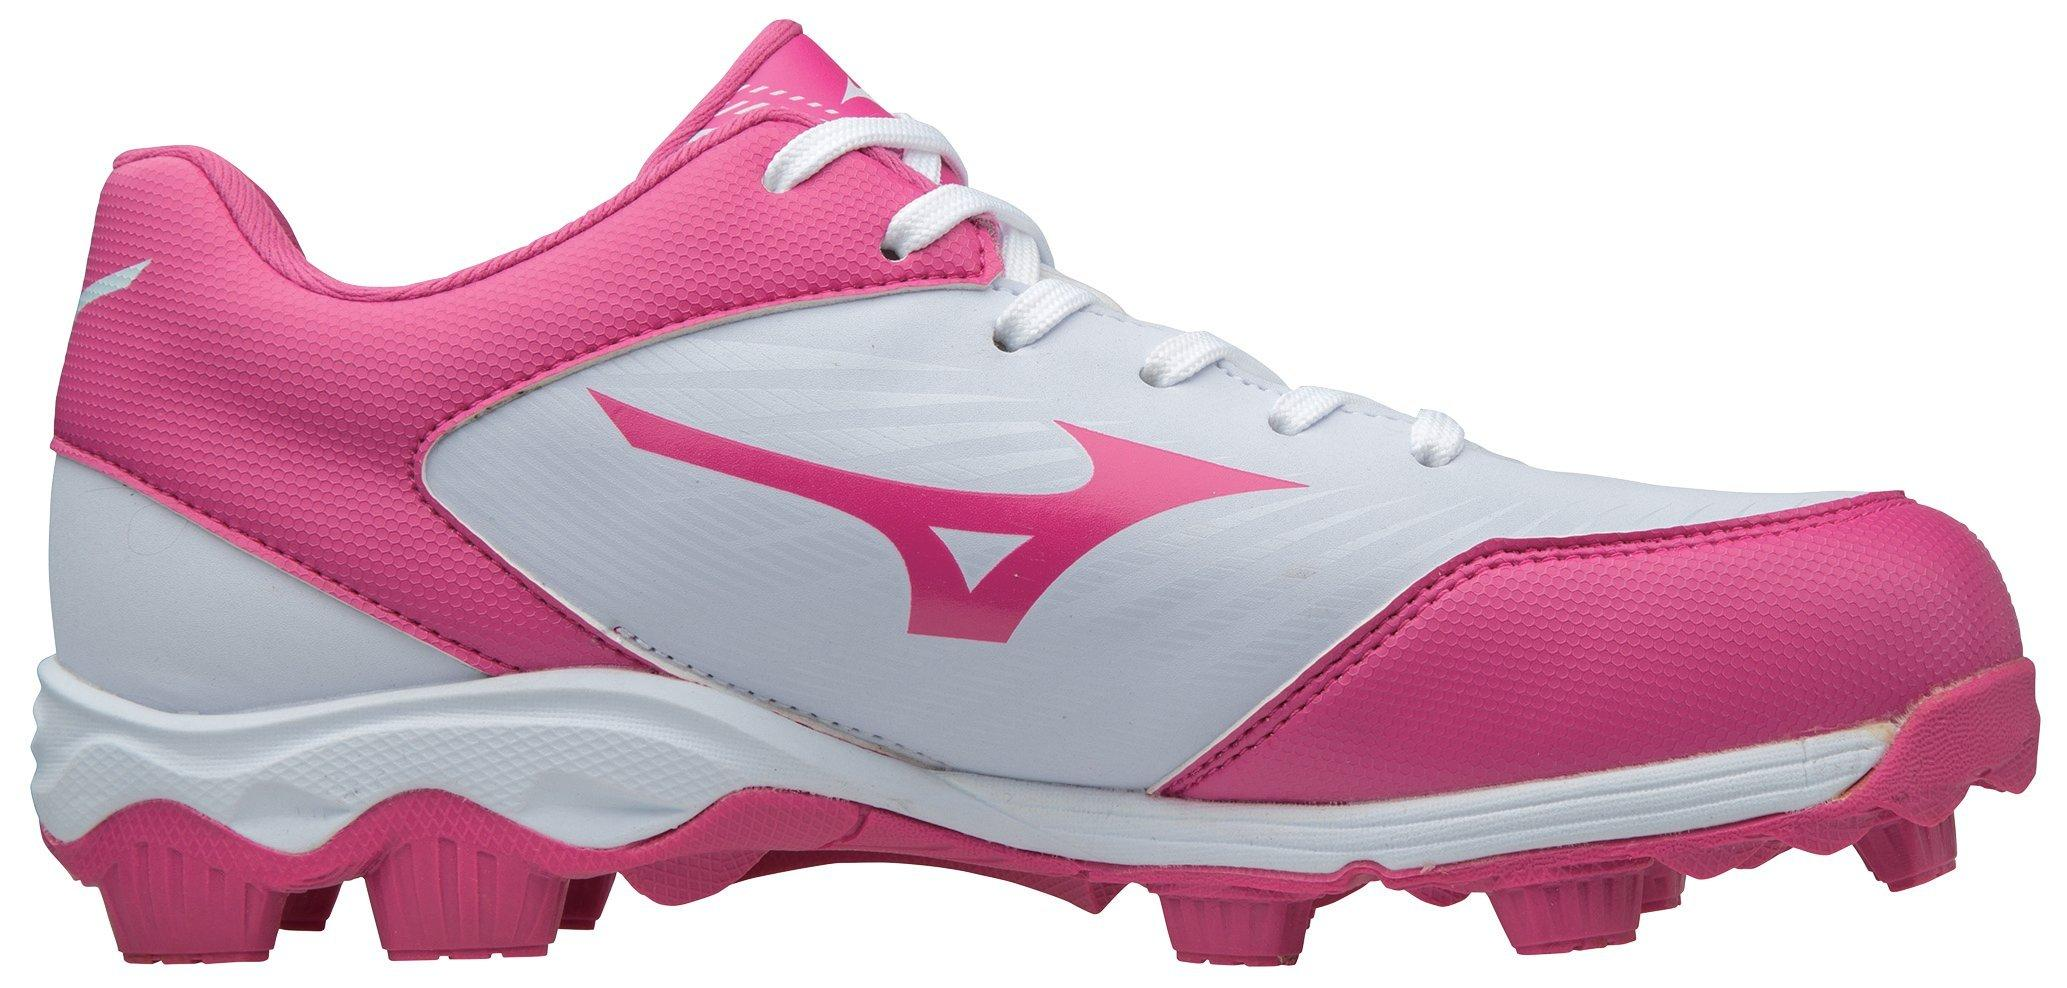 Mizuno Womens 9-Spike Advanced Finch Franchise 7 Molded Softball Cleat Shoe